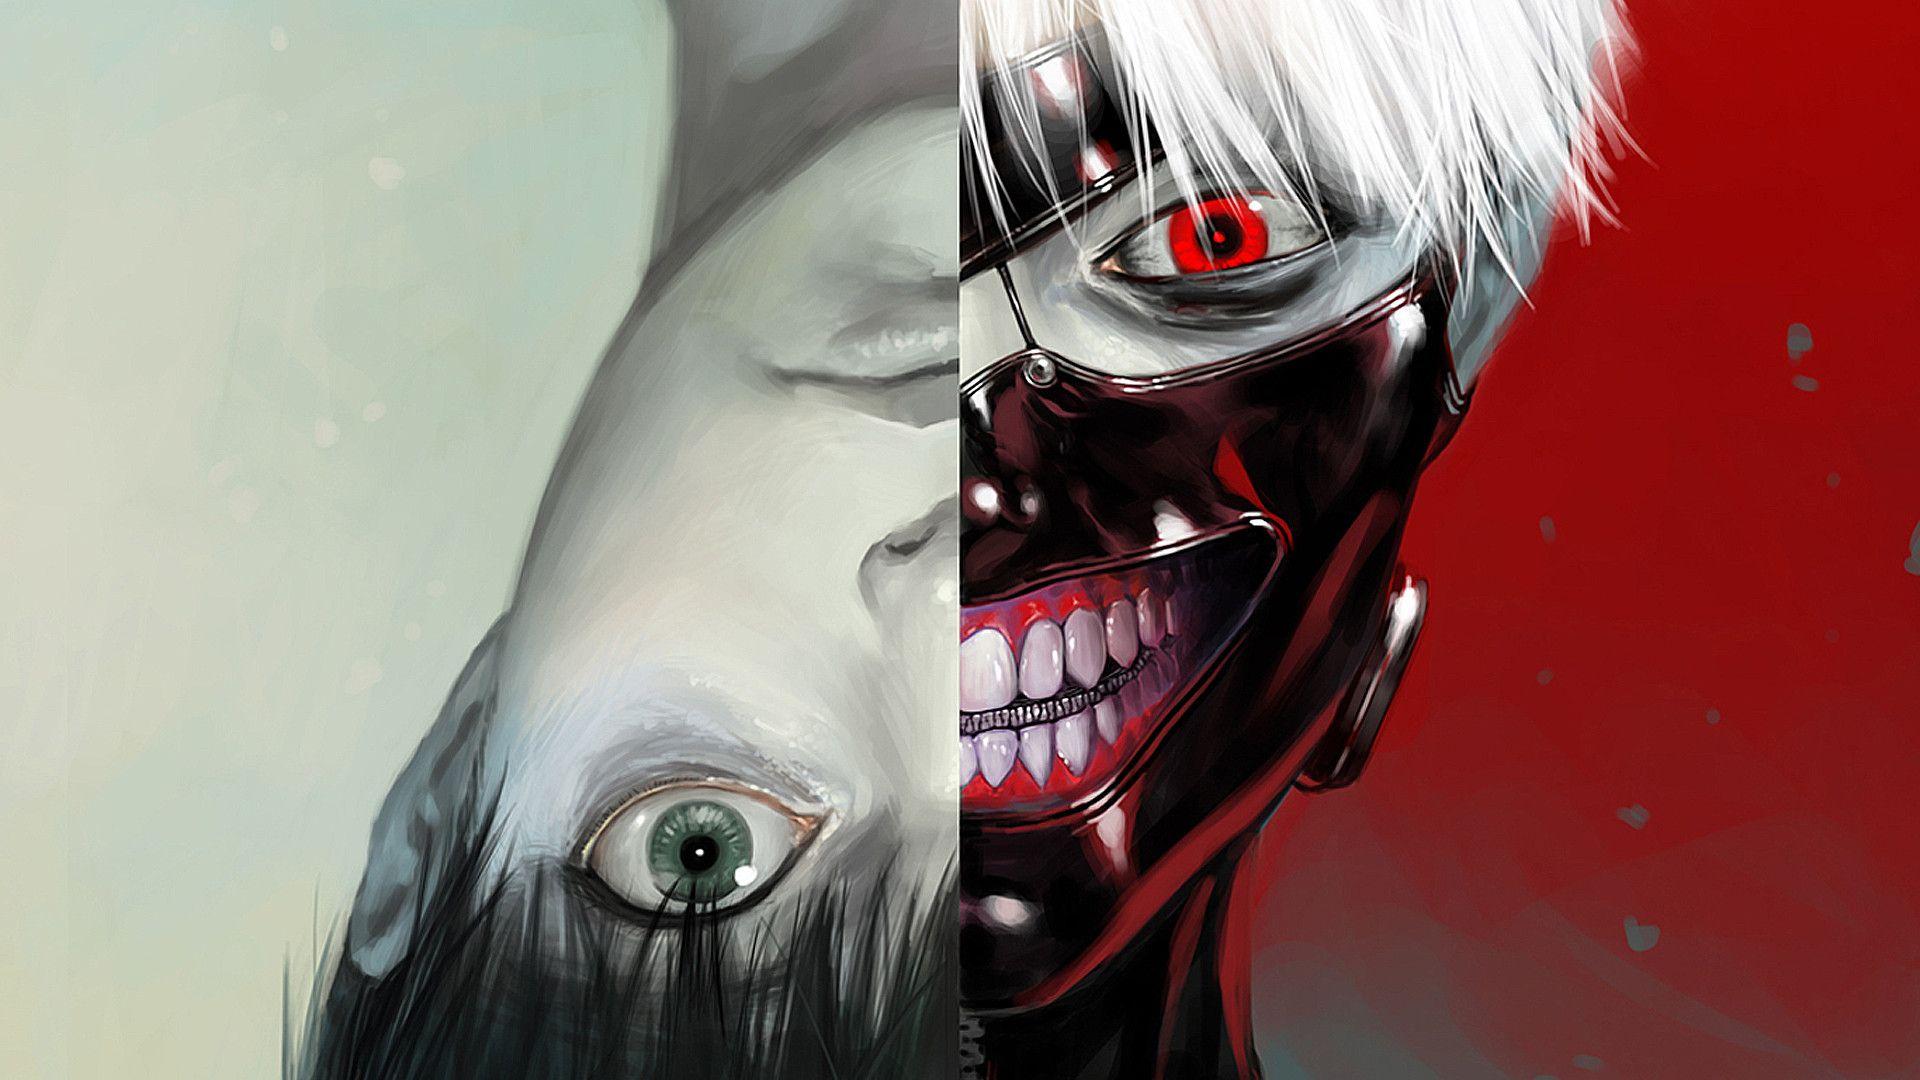 Fondos De Pantalla De Tokyo Ghoul Fondosmil